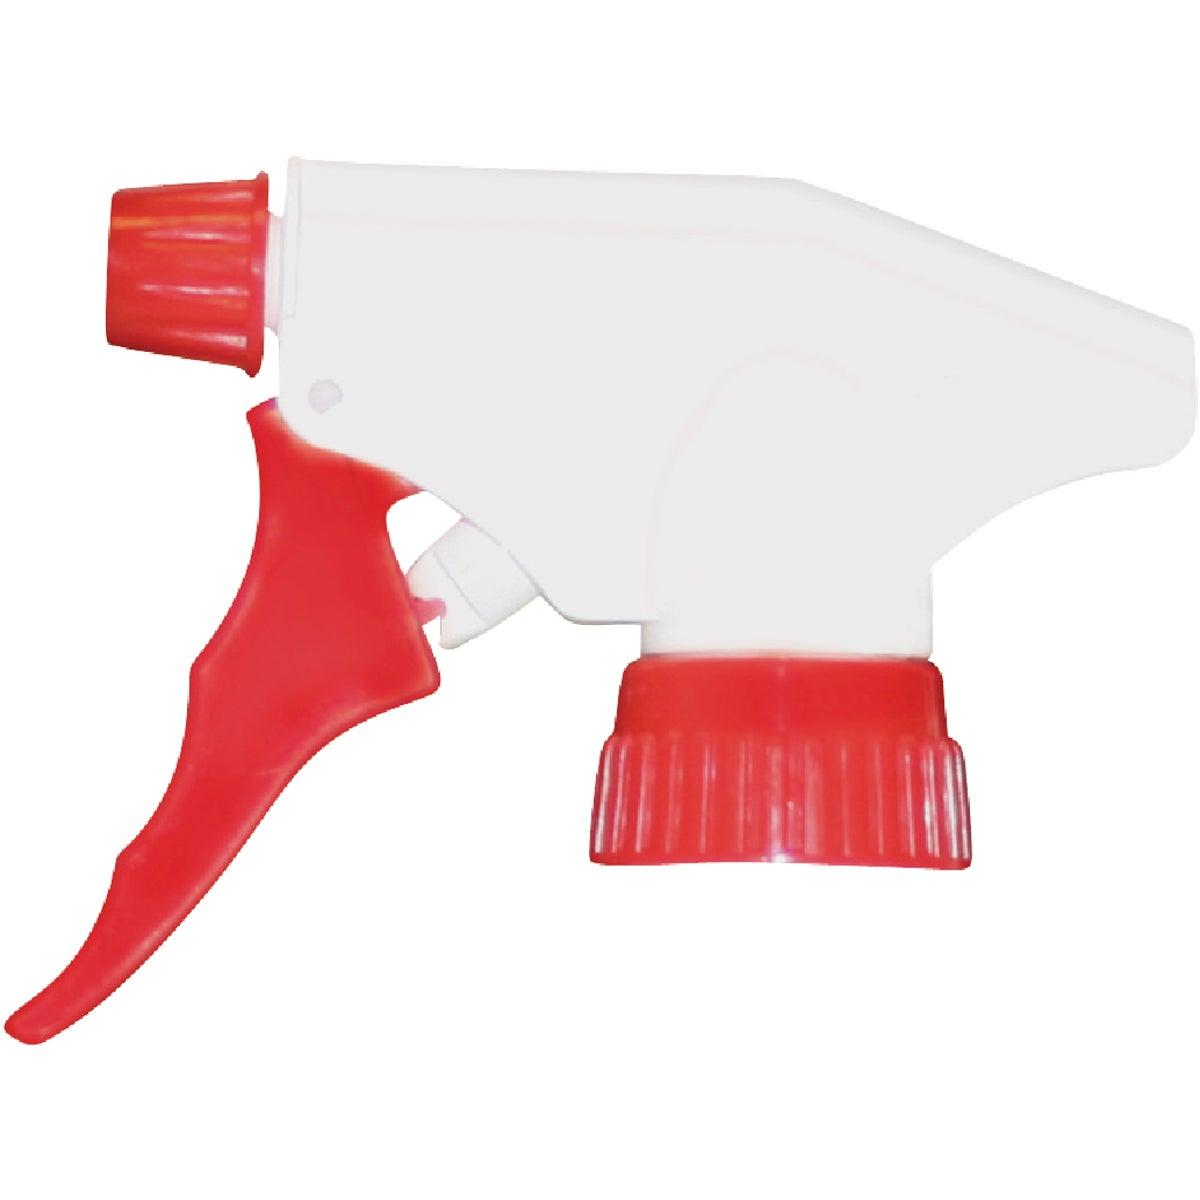 Sprayer Head